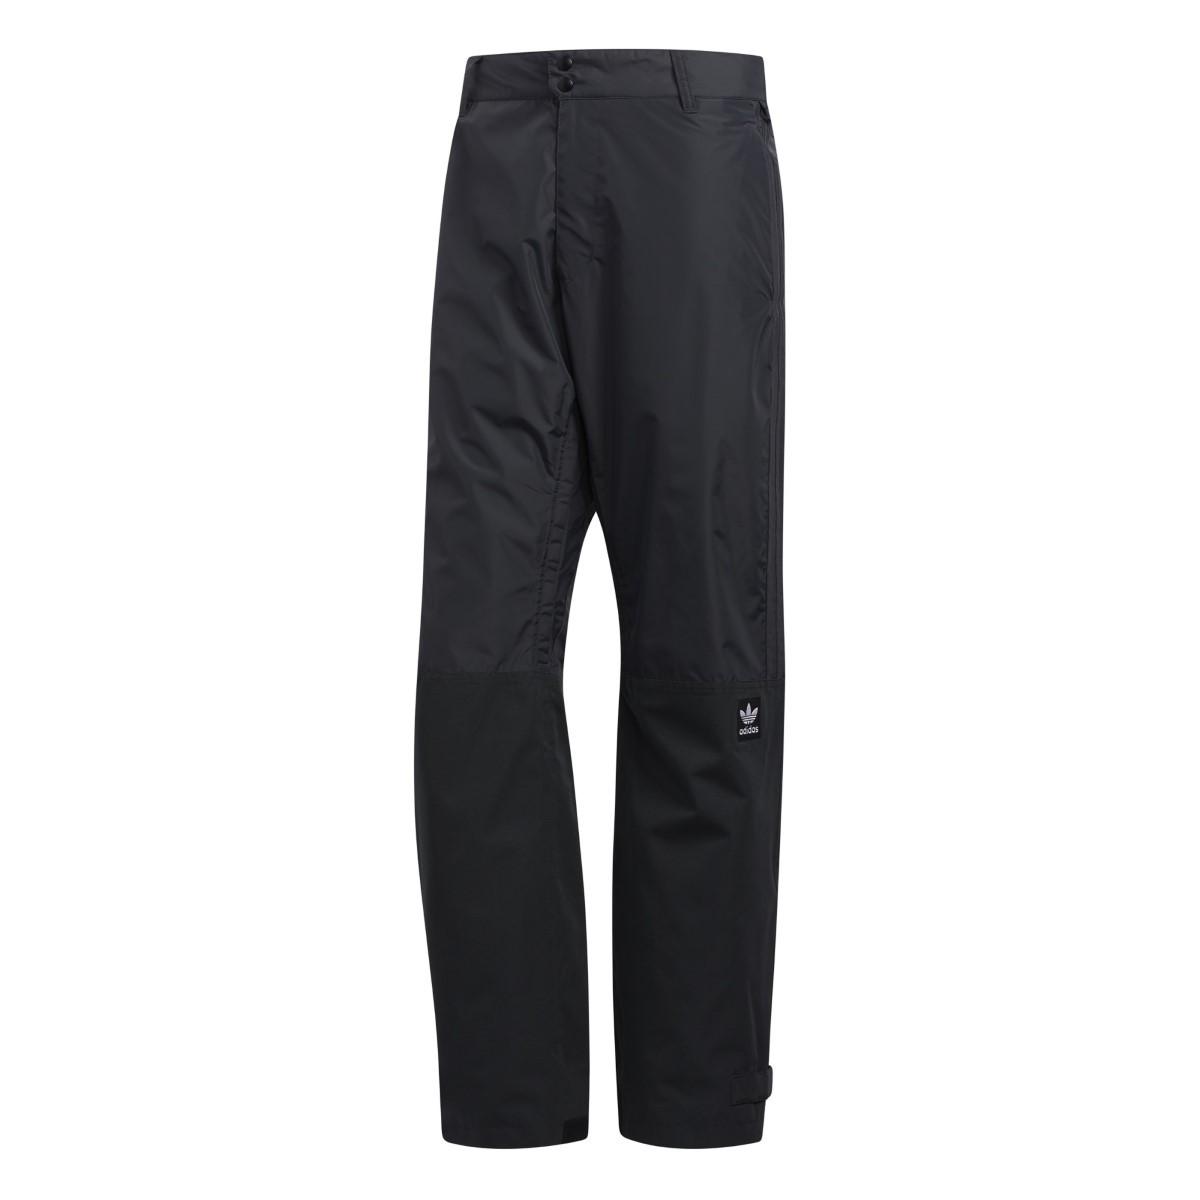 Adidas M Riding Pant 2020